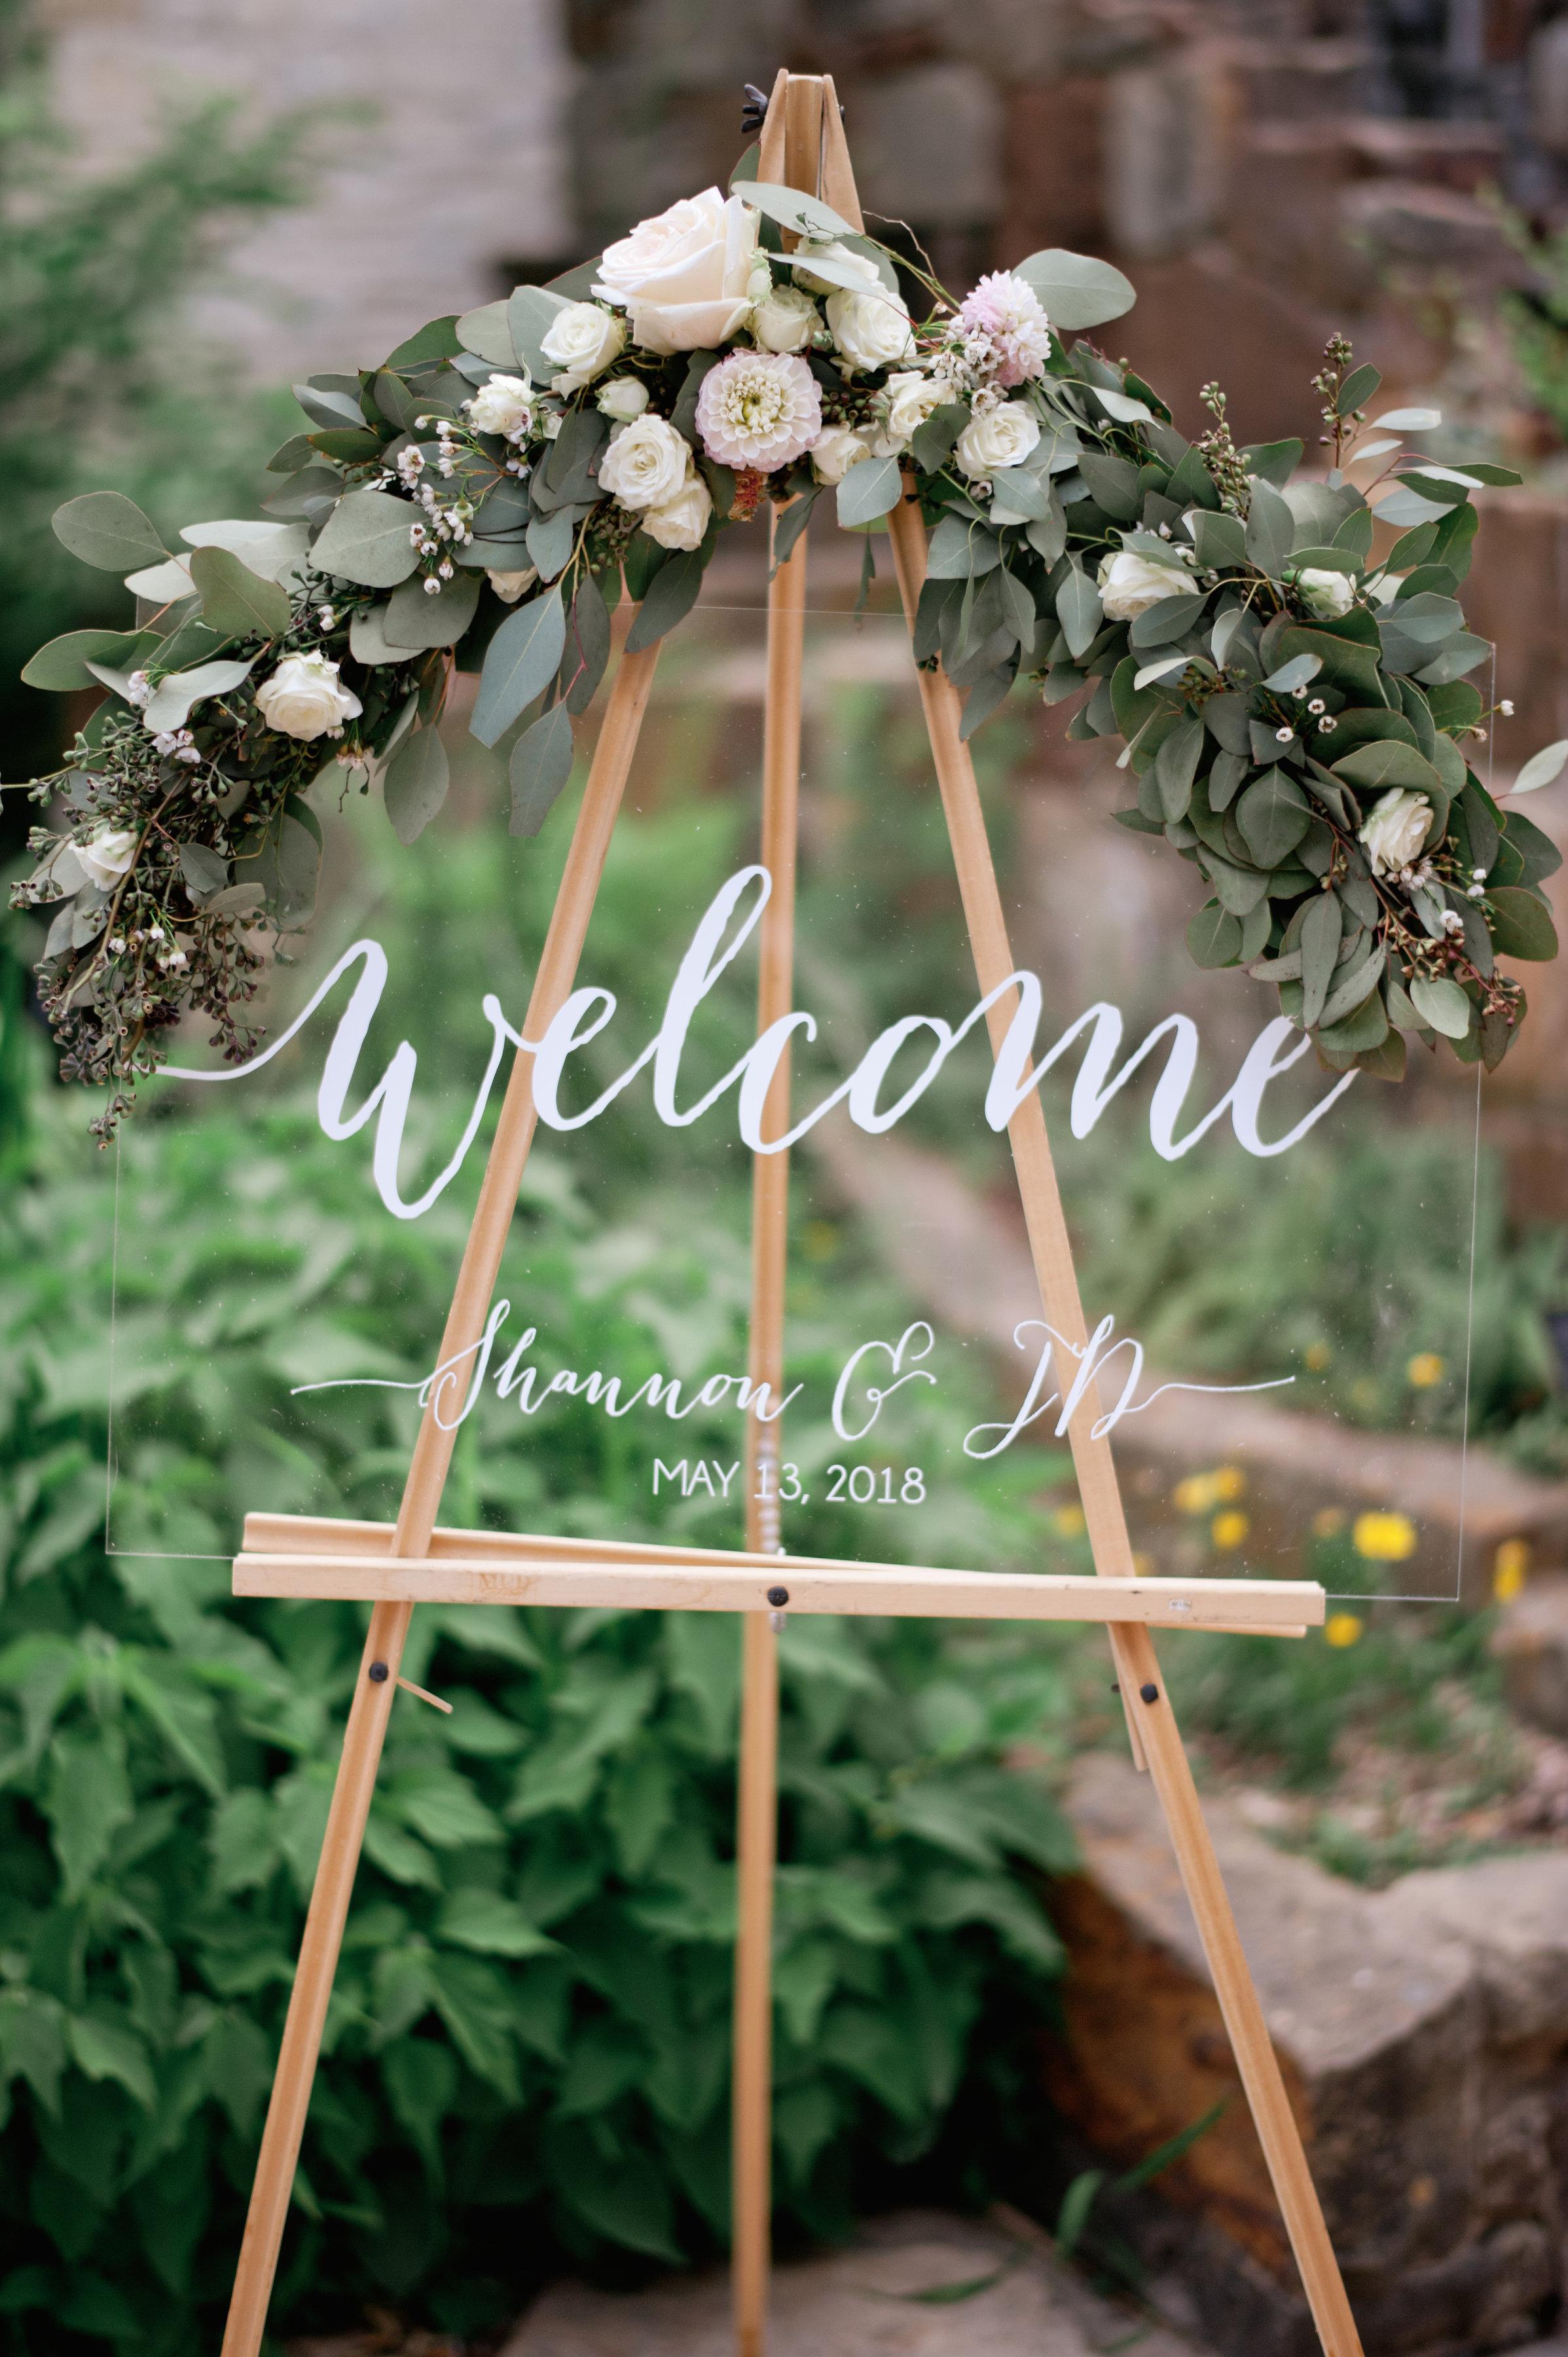 Shannon&JDWedding-Ceremony-AprilMaeCreative-11.jpg